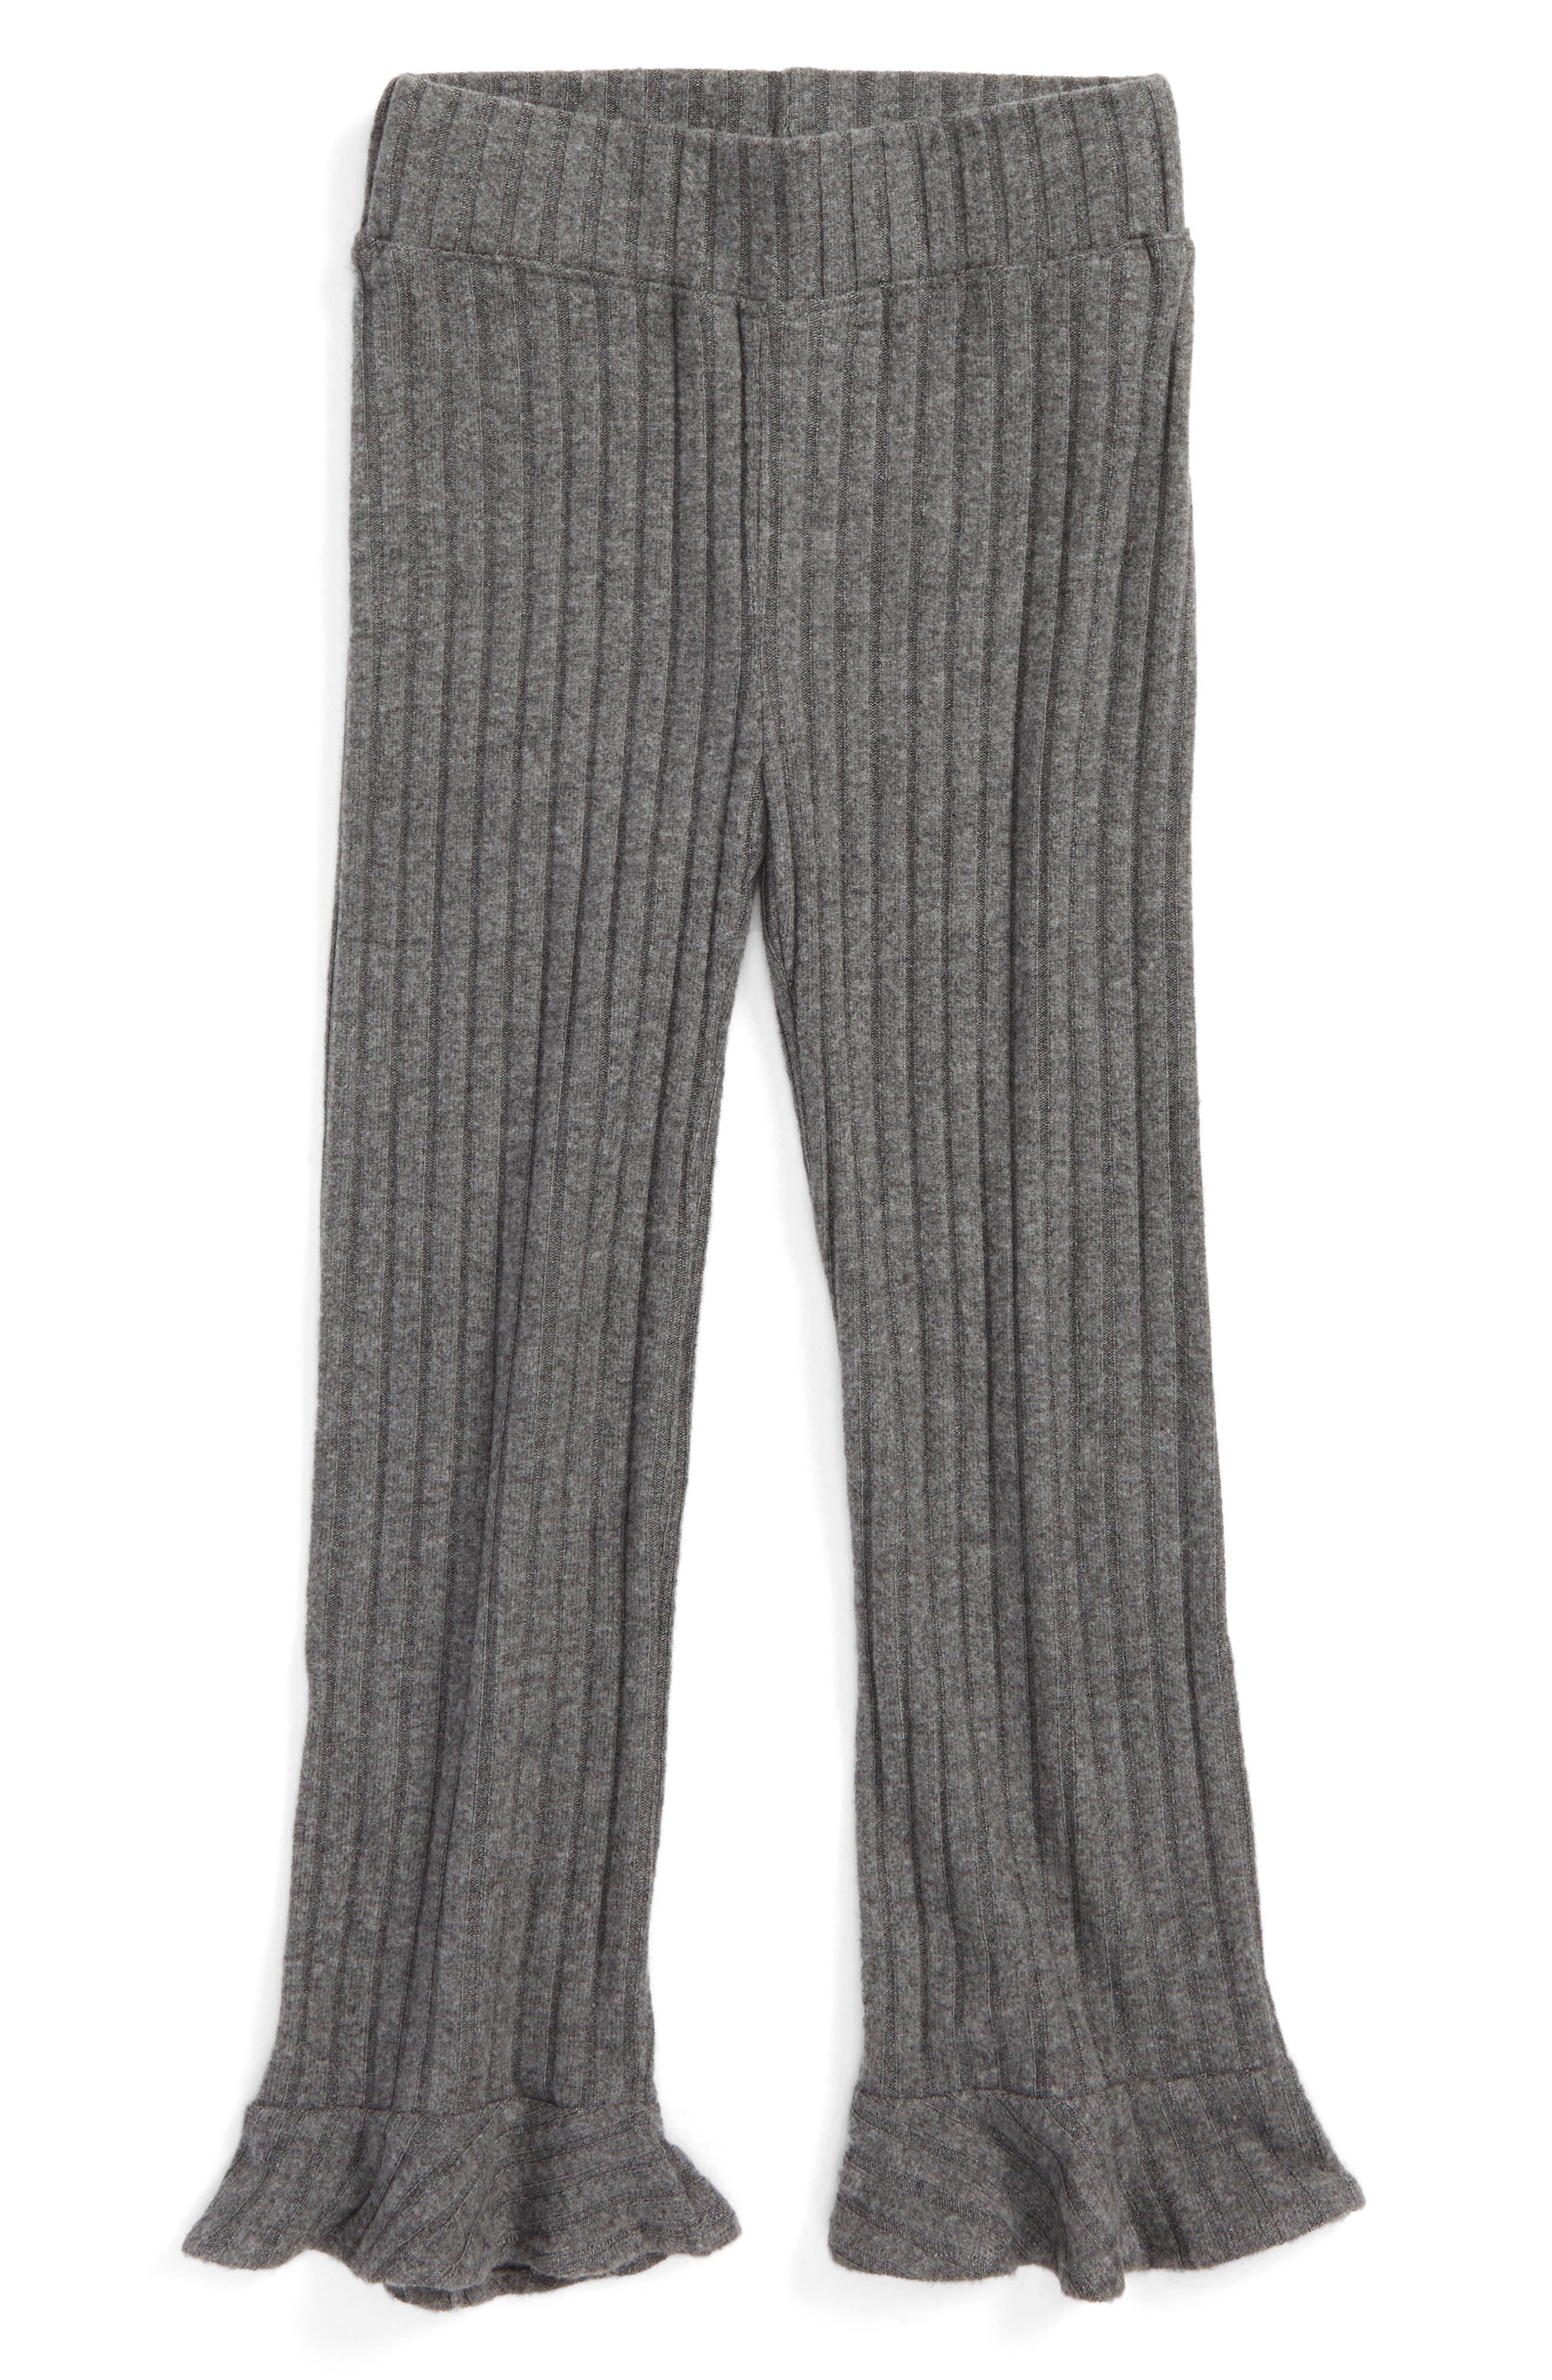 Penny Organic Cotton Flared Ruffle Pants,                         Main,                         color, Charcoal Rib